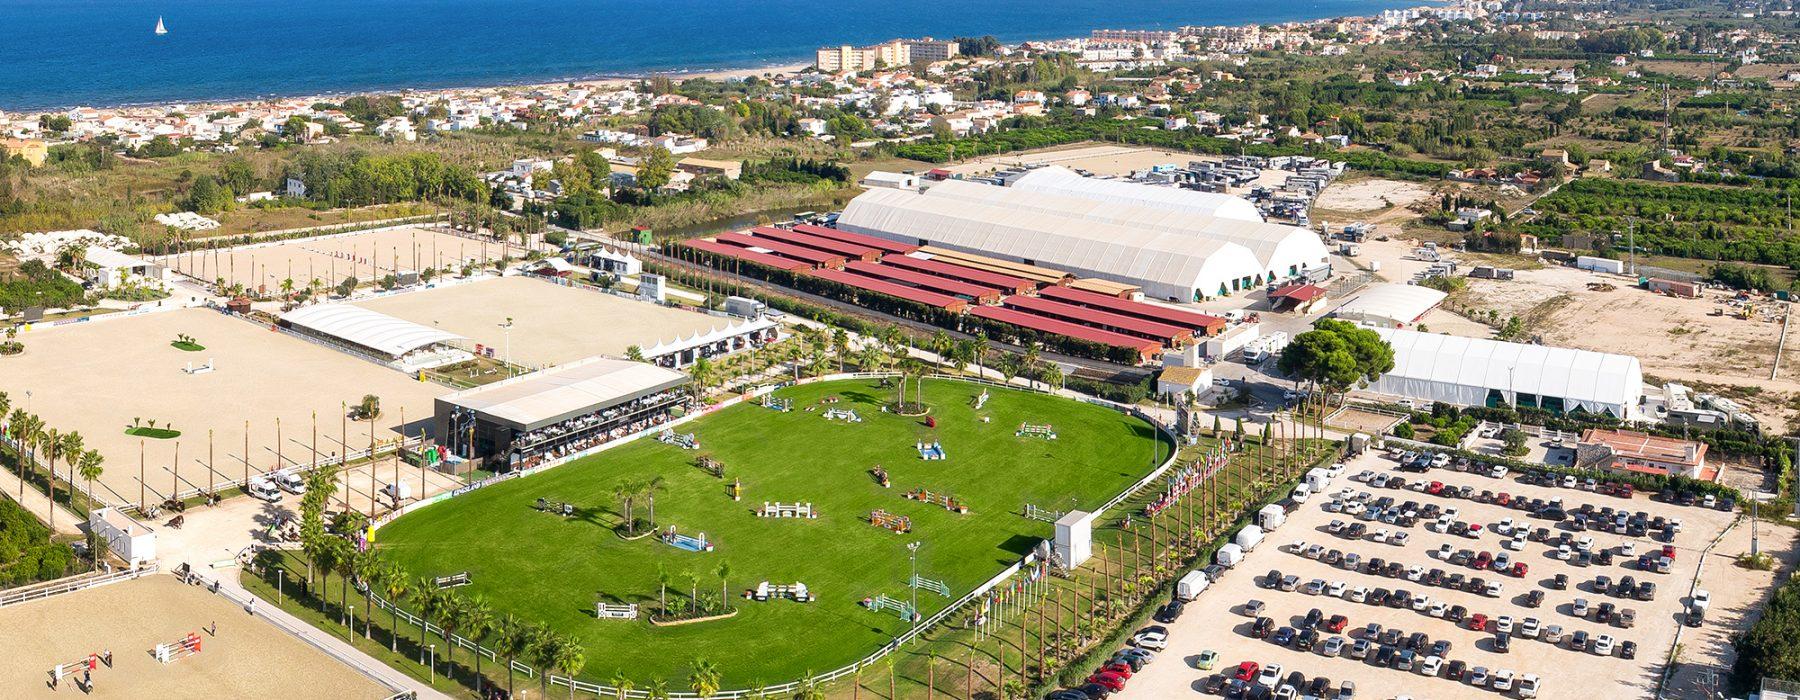 Mediterranean Equestrian Tour